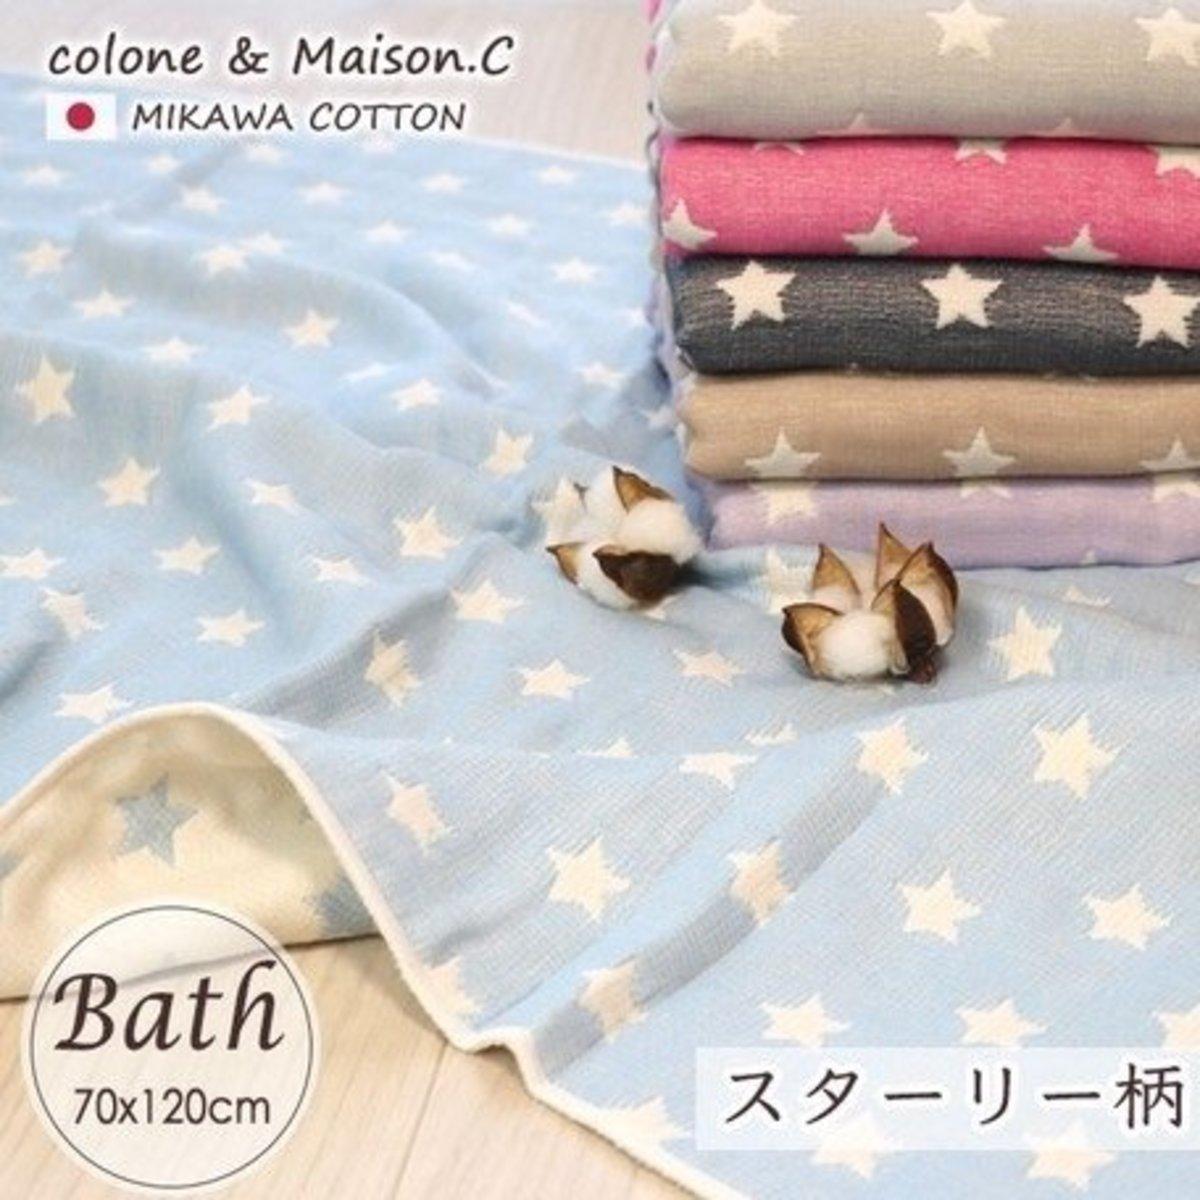 Cotton Sixfold Yarn Bath Towel (Made in Japan) 120x60cm (Light Blue)